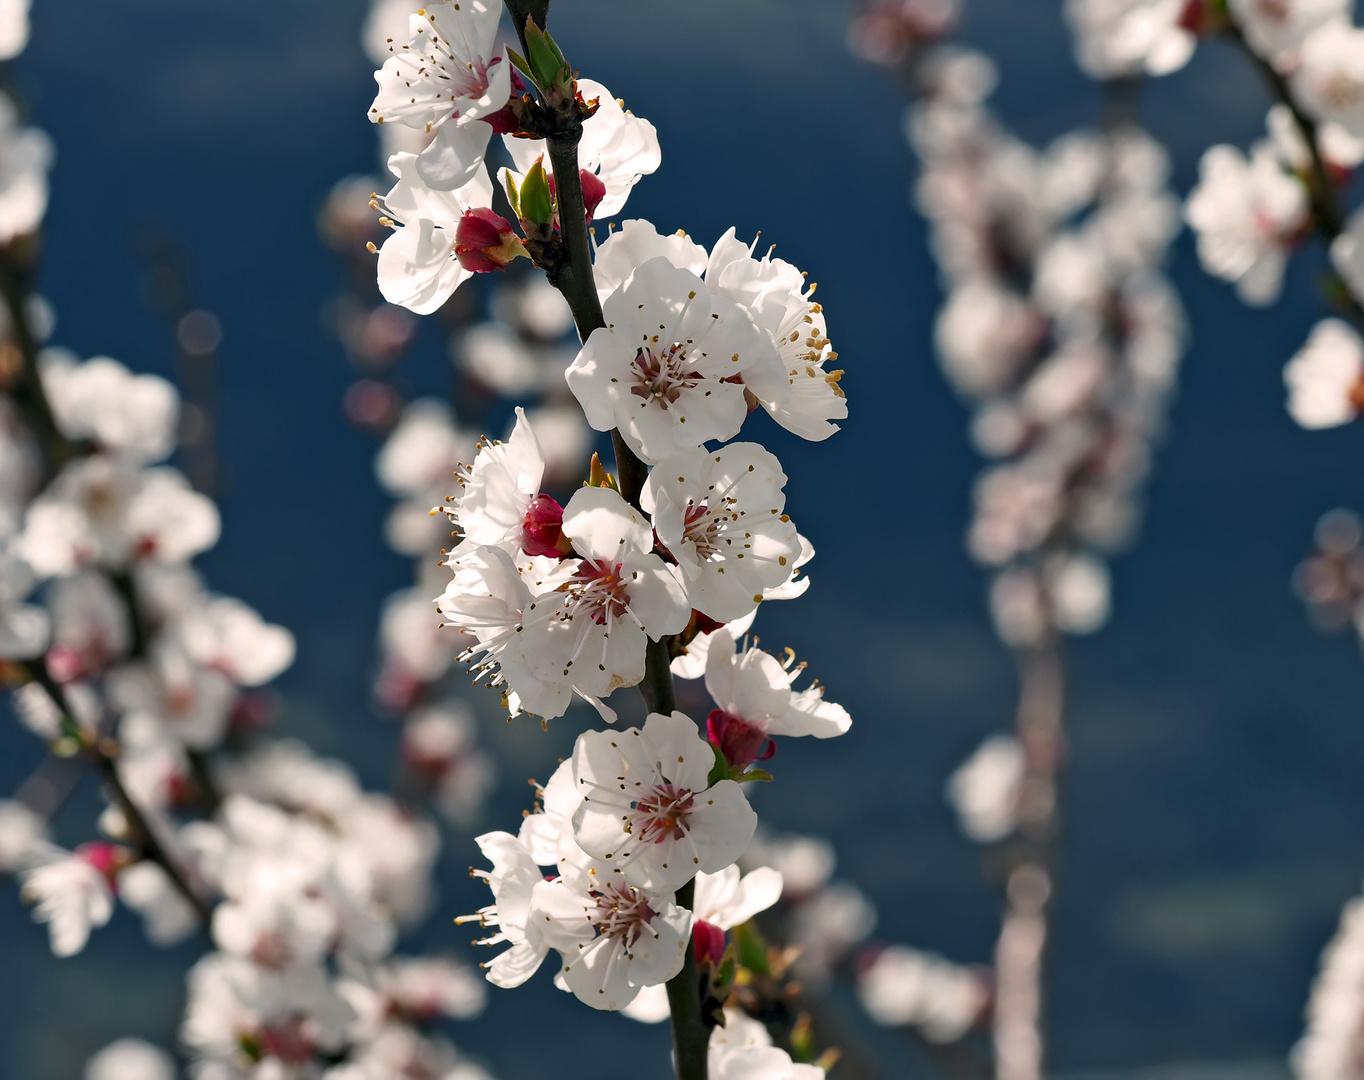 Blütenzauber! - Les merveilles du printemps!